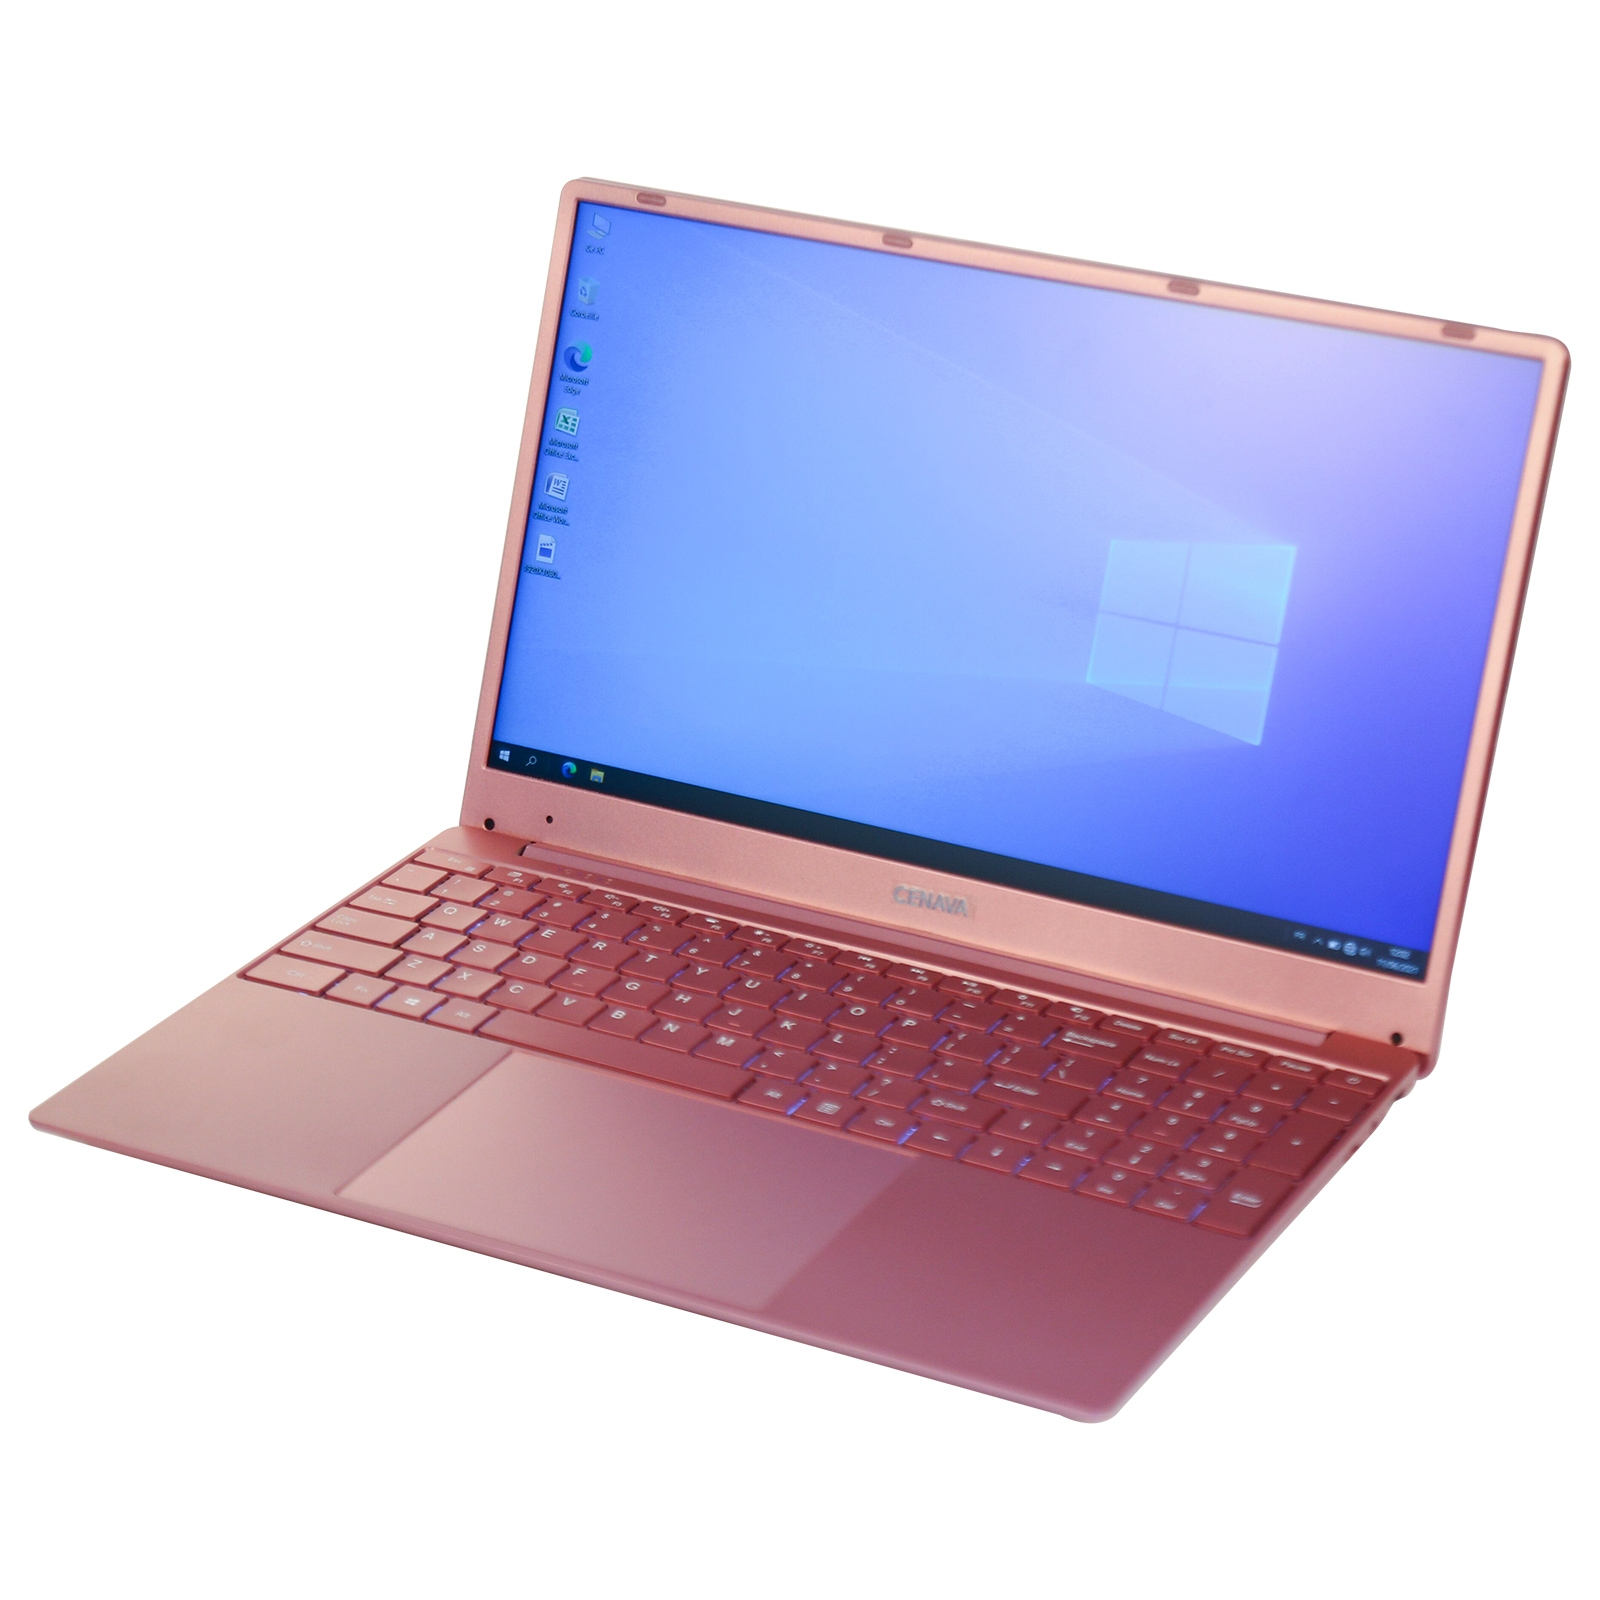 CENAVA F151 Ultrabook, 15.6 inch, 12GB+256GB, Windows 10 Intel Celeron J4105 Quad Core Up to 2.5GHz, Support TF Card & Bluetooth & Dual WiFi & Mini HDMI, US/EU Plug(Rose Gold)